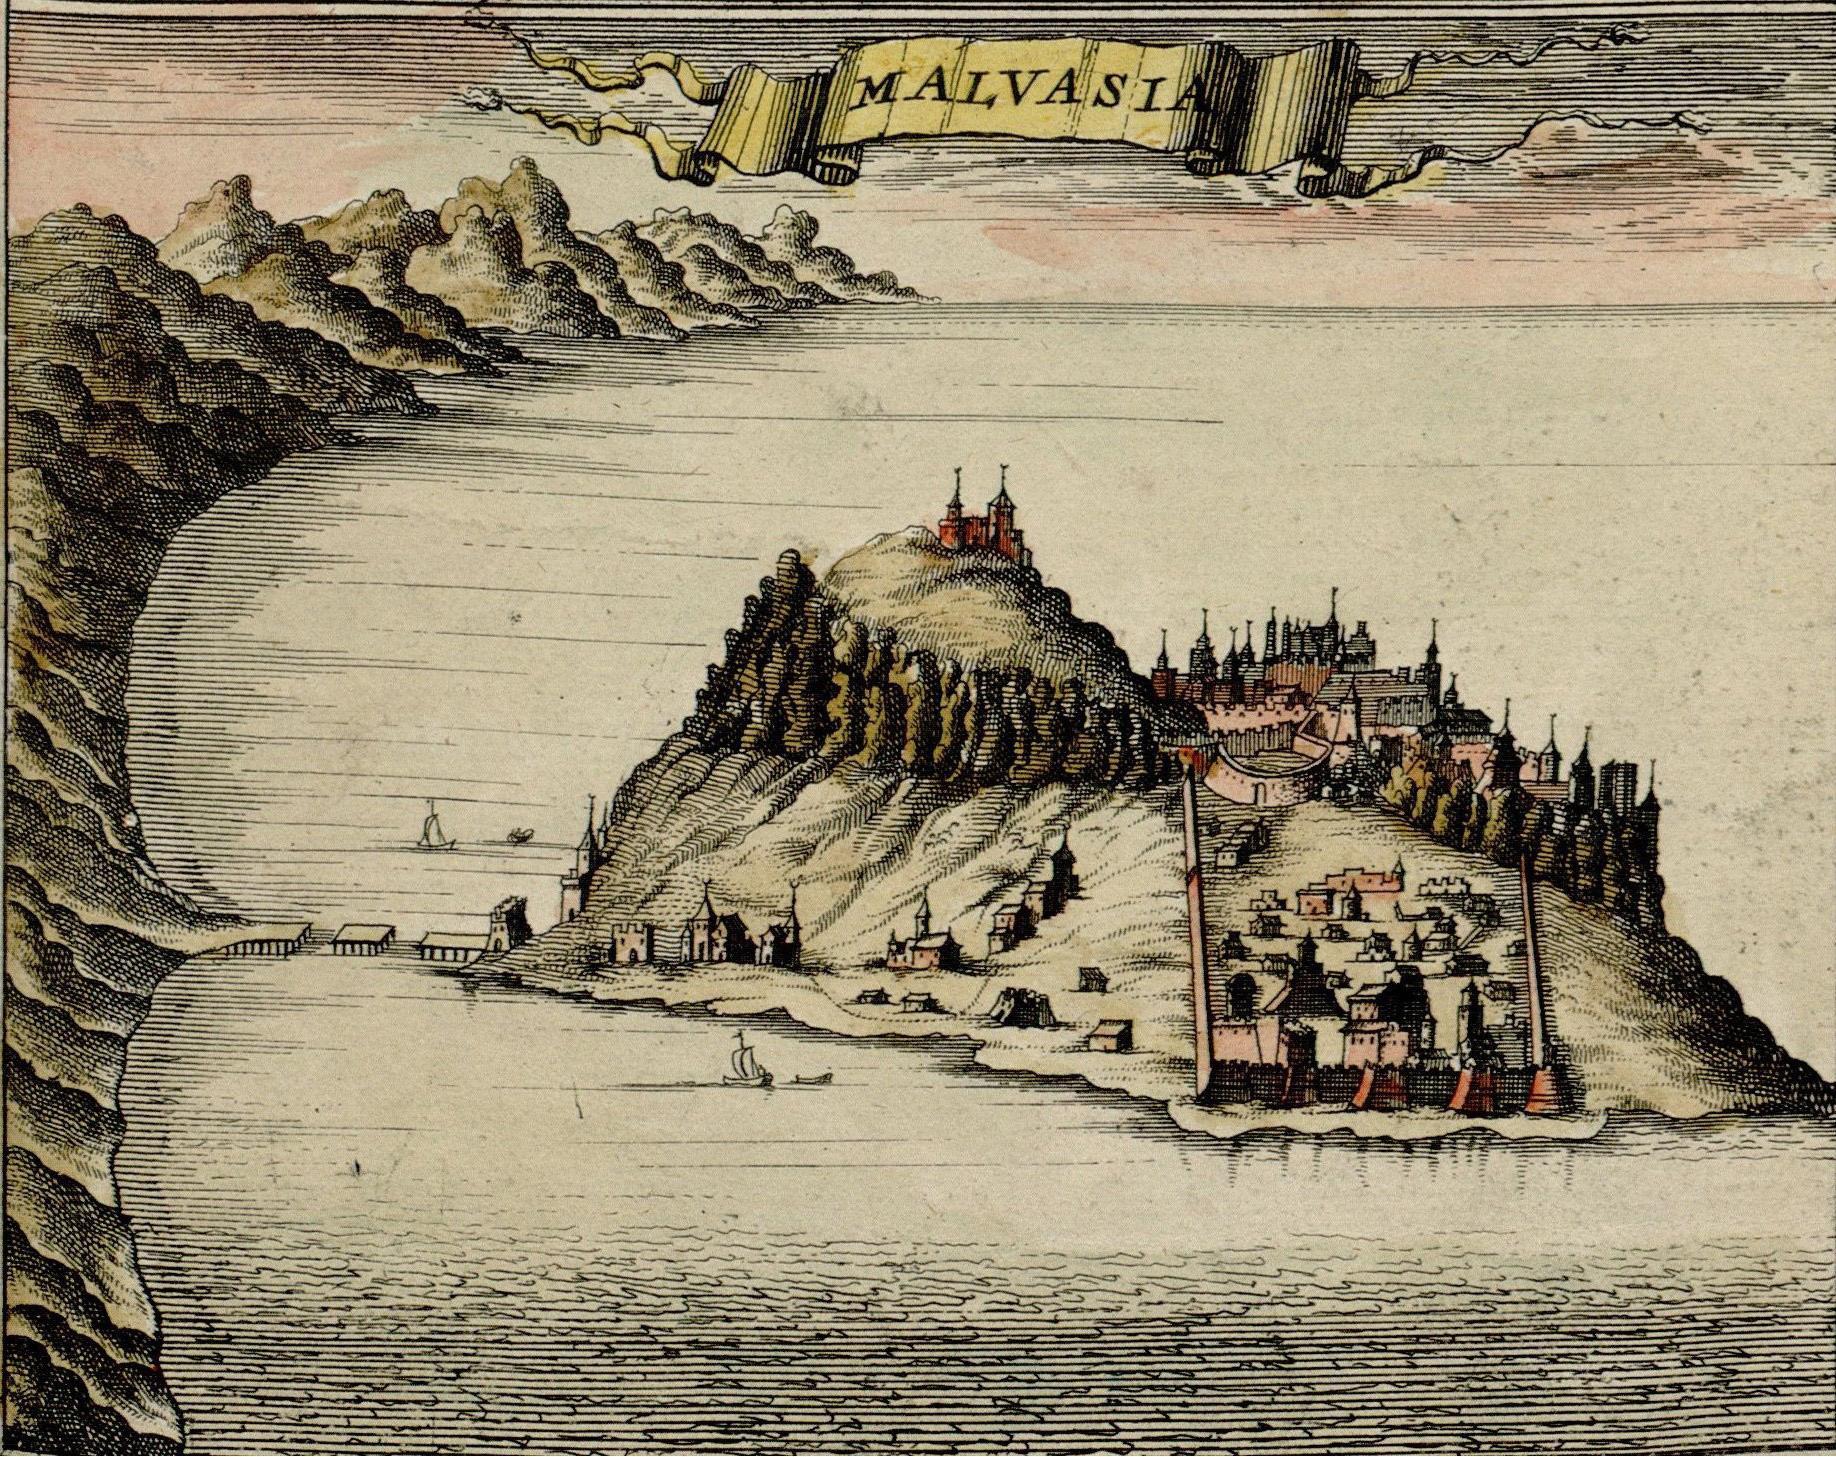 http://upload.wikimedia.org/wikipedia/commons/c/c2/De_wit_1680_monemvasia_b.jpg